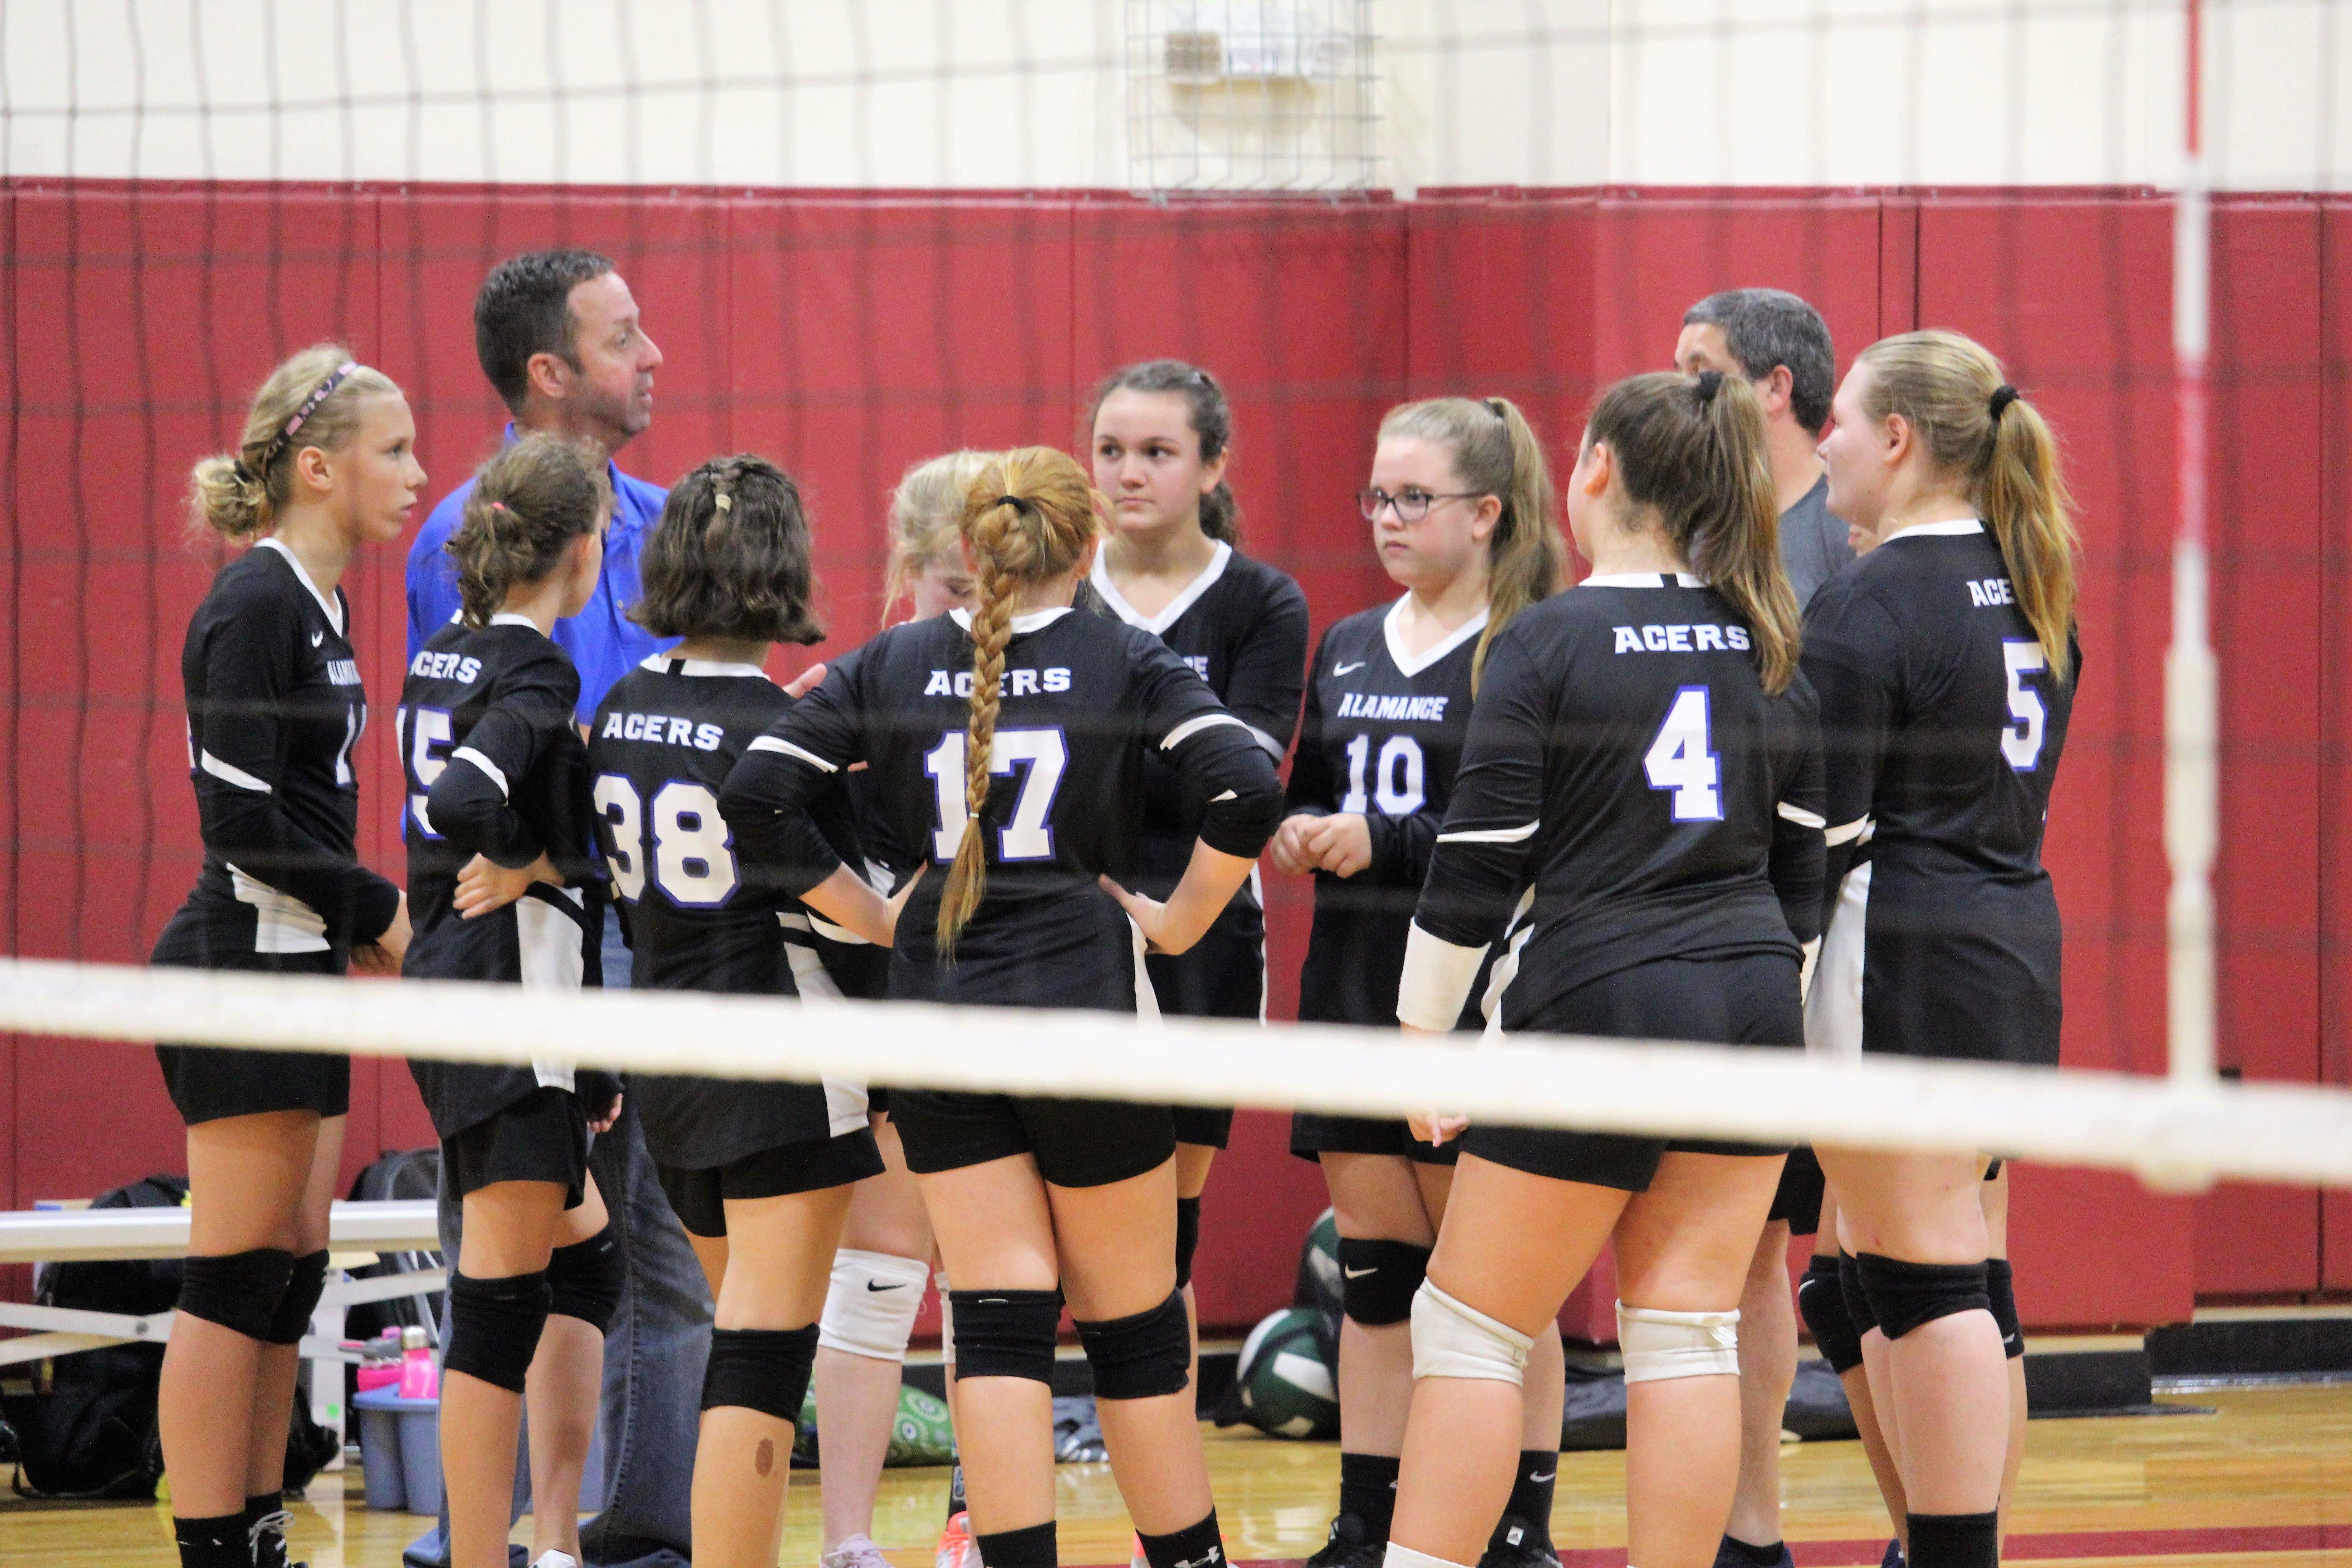 Volleyball Team In 2020 Volleyball Team Volleyball Teams